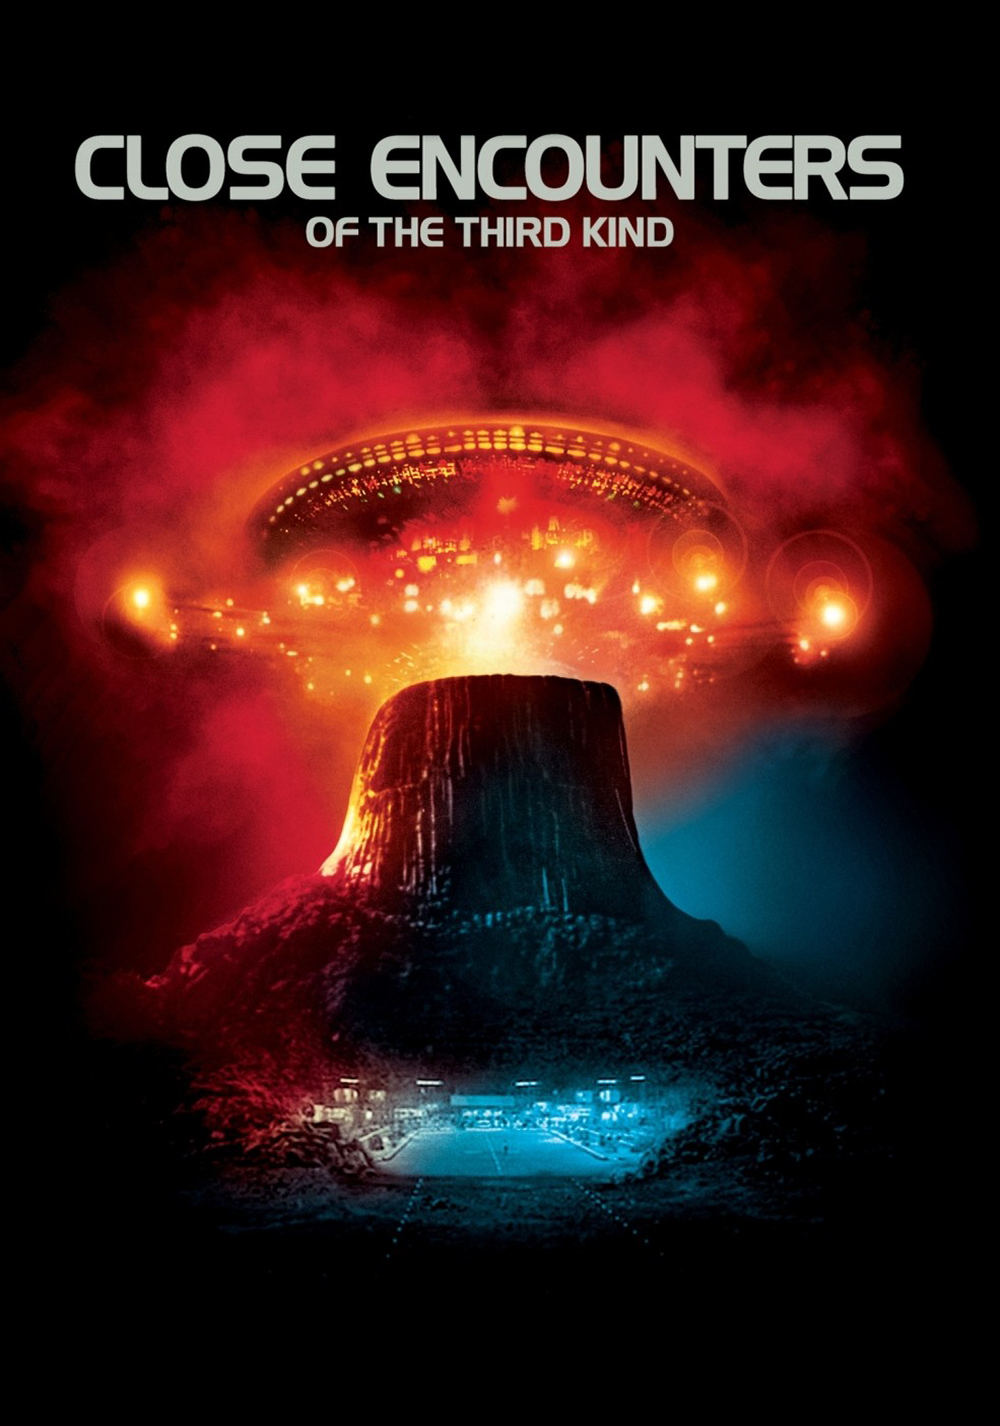 Close Encounters of the Third Kind : Movie fanart : fanart.tv